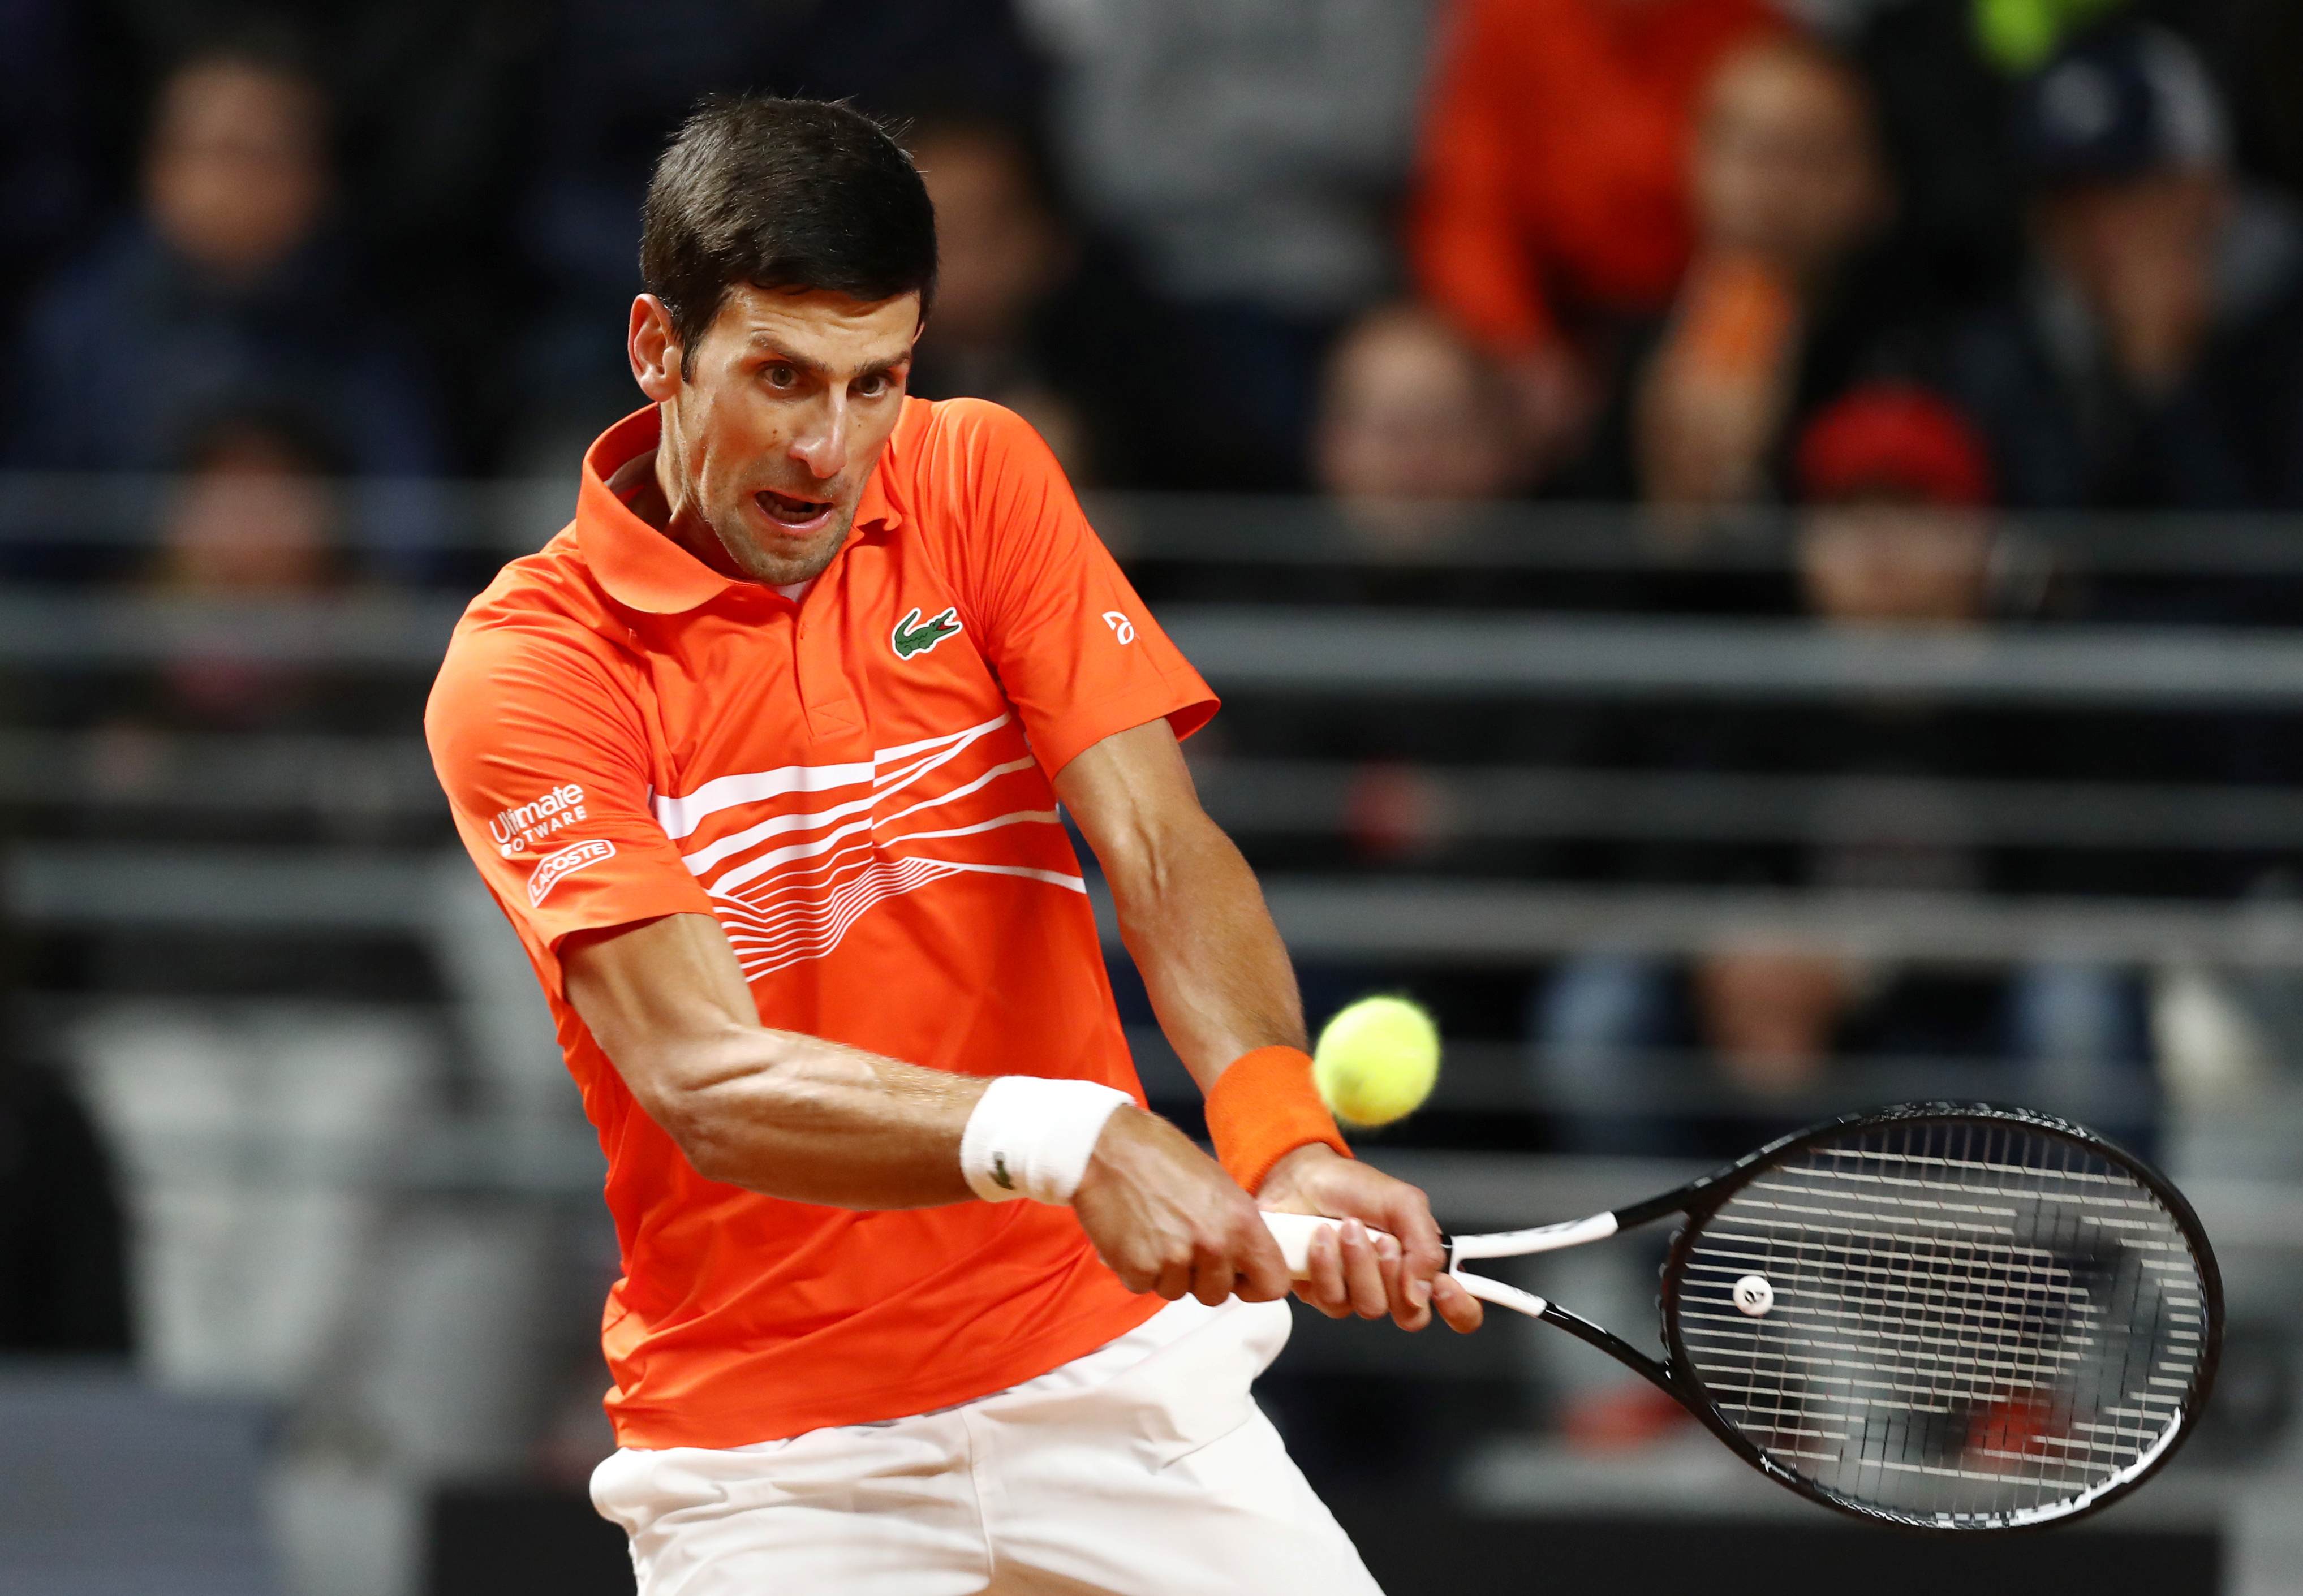 Tennis - ATP - Masters 1000 de Rome : la demi-finale Djokovic-Schwartzman en direct